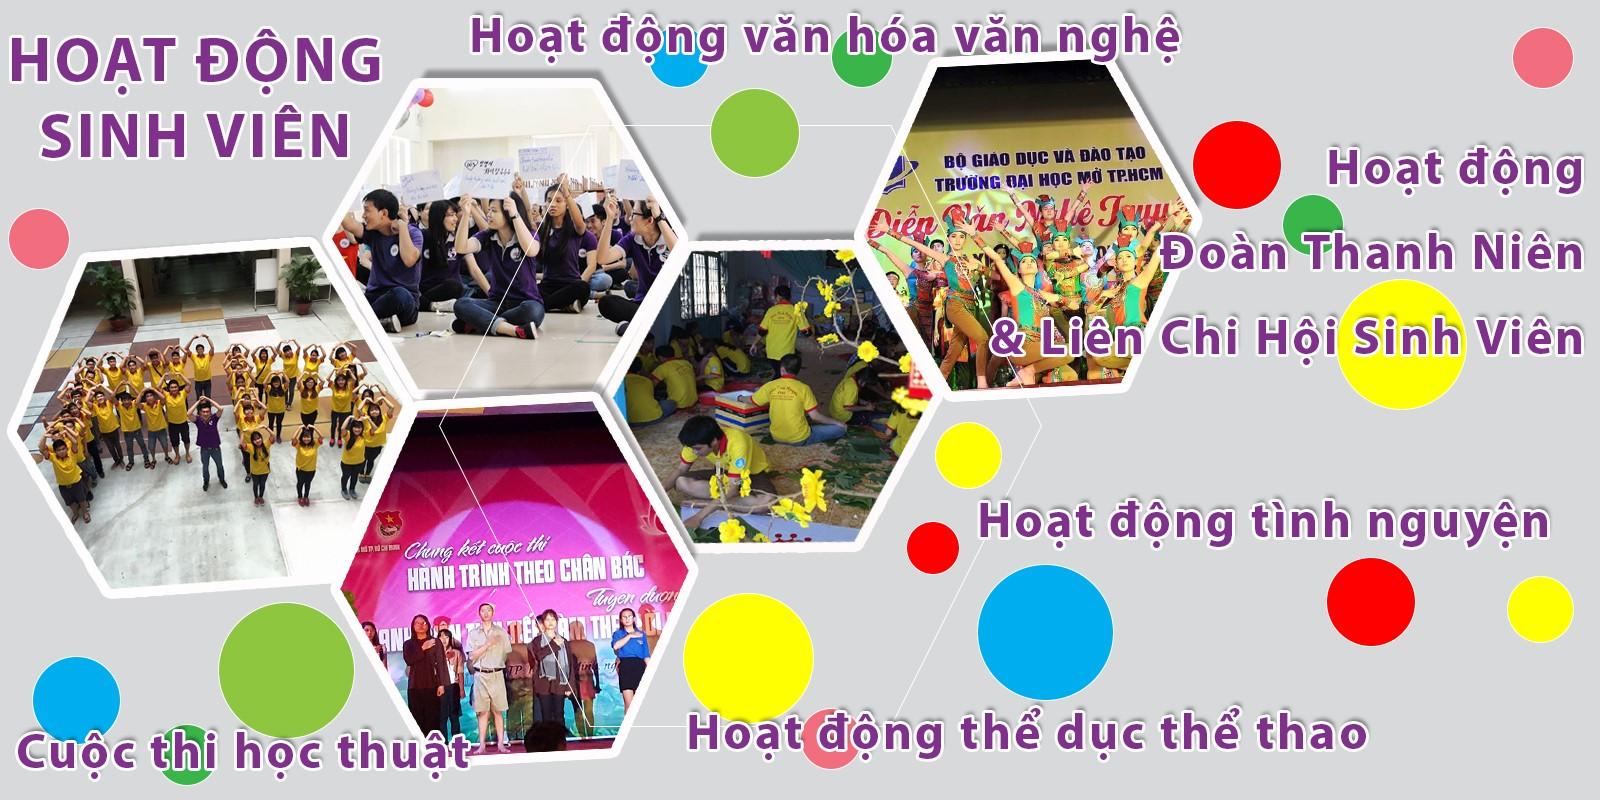 hoat_dong_sinh_vien-copy